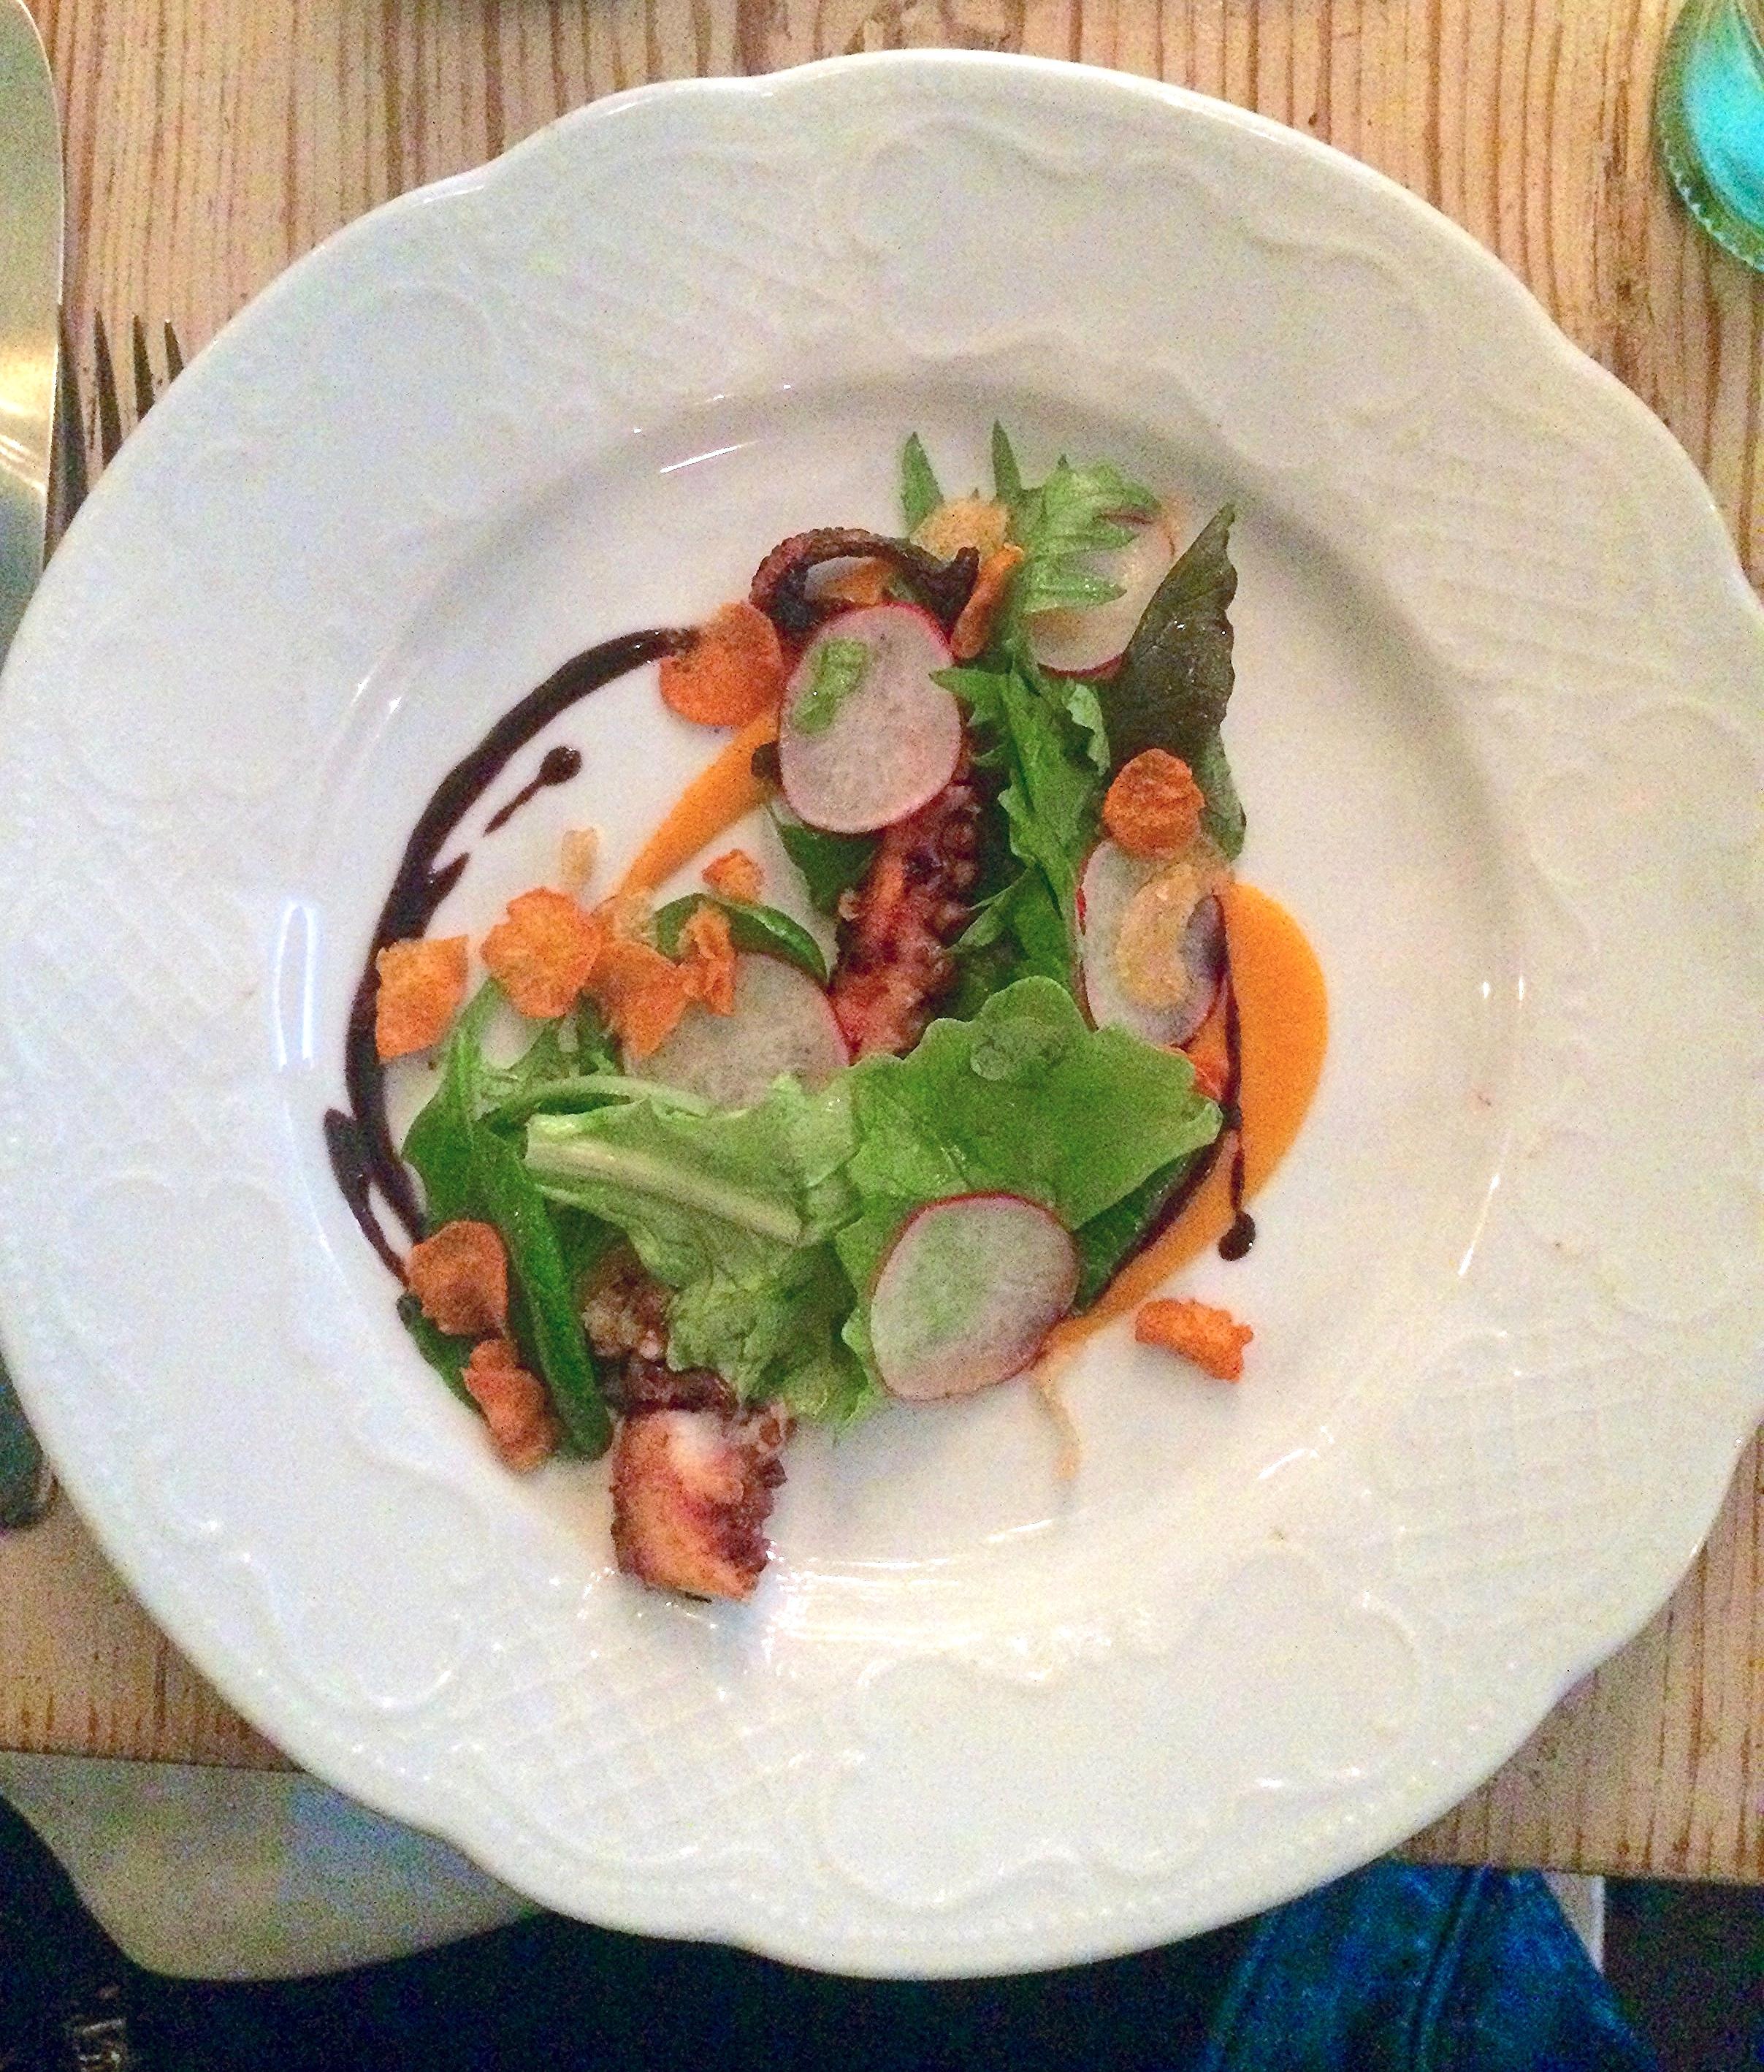 preserved lemon braised octopus, smoked sweet potato puree, black garlic, garlic chips